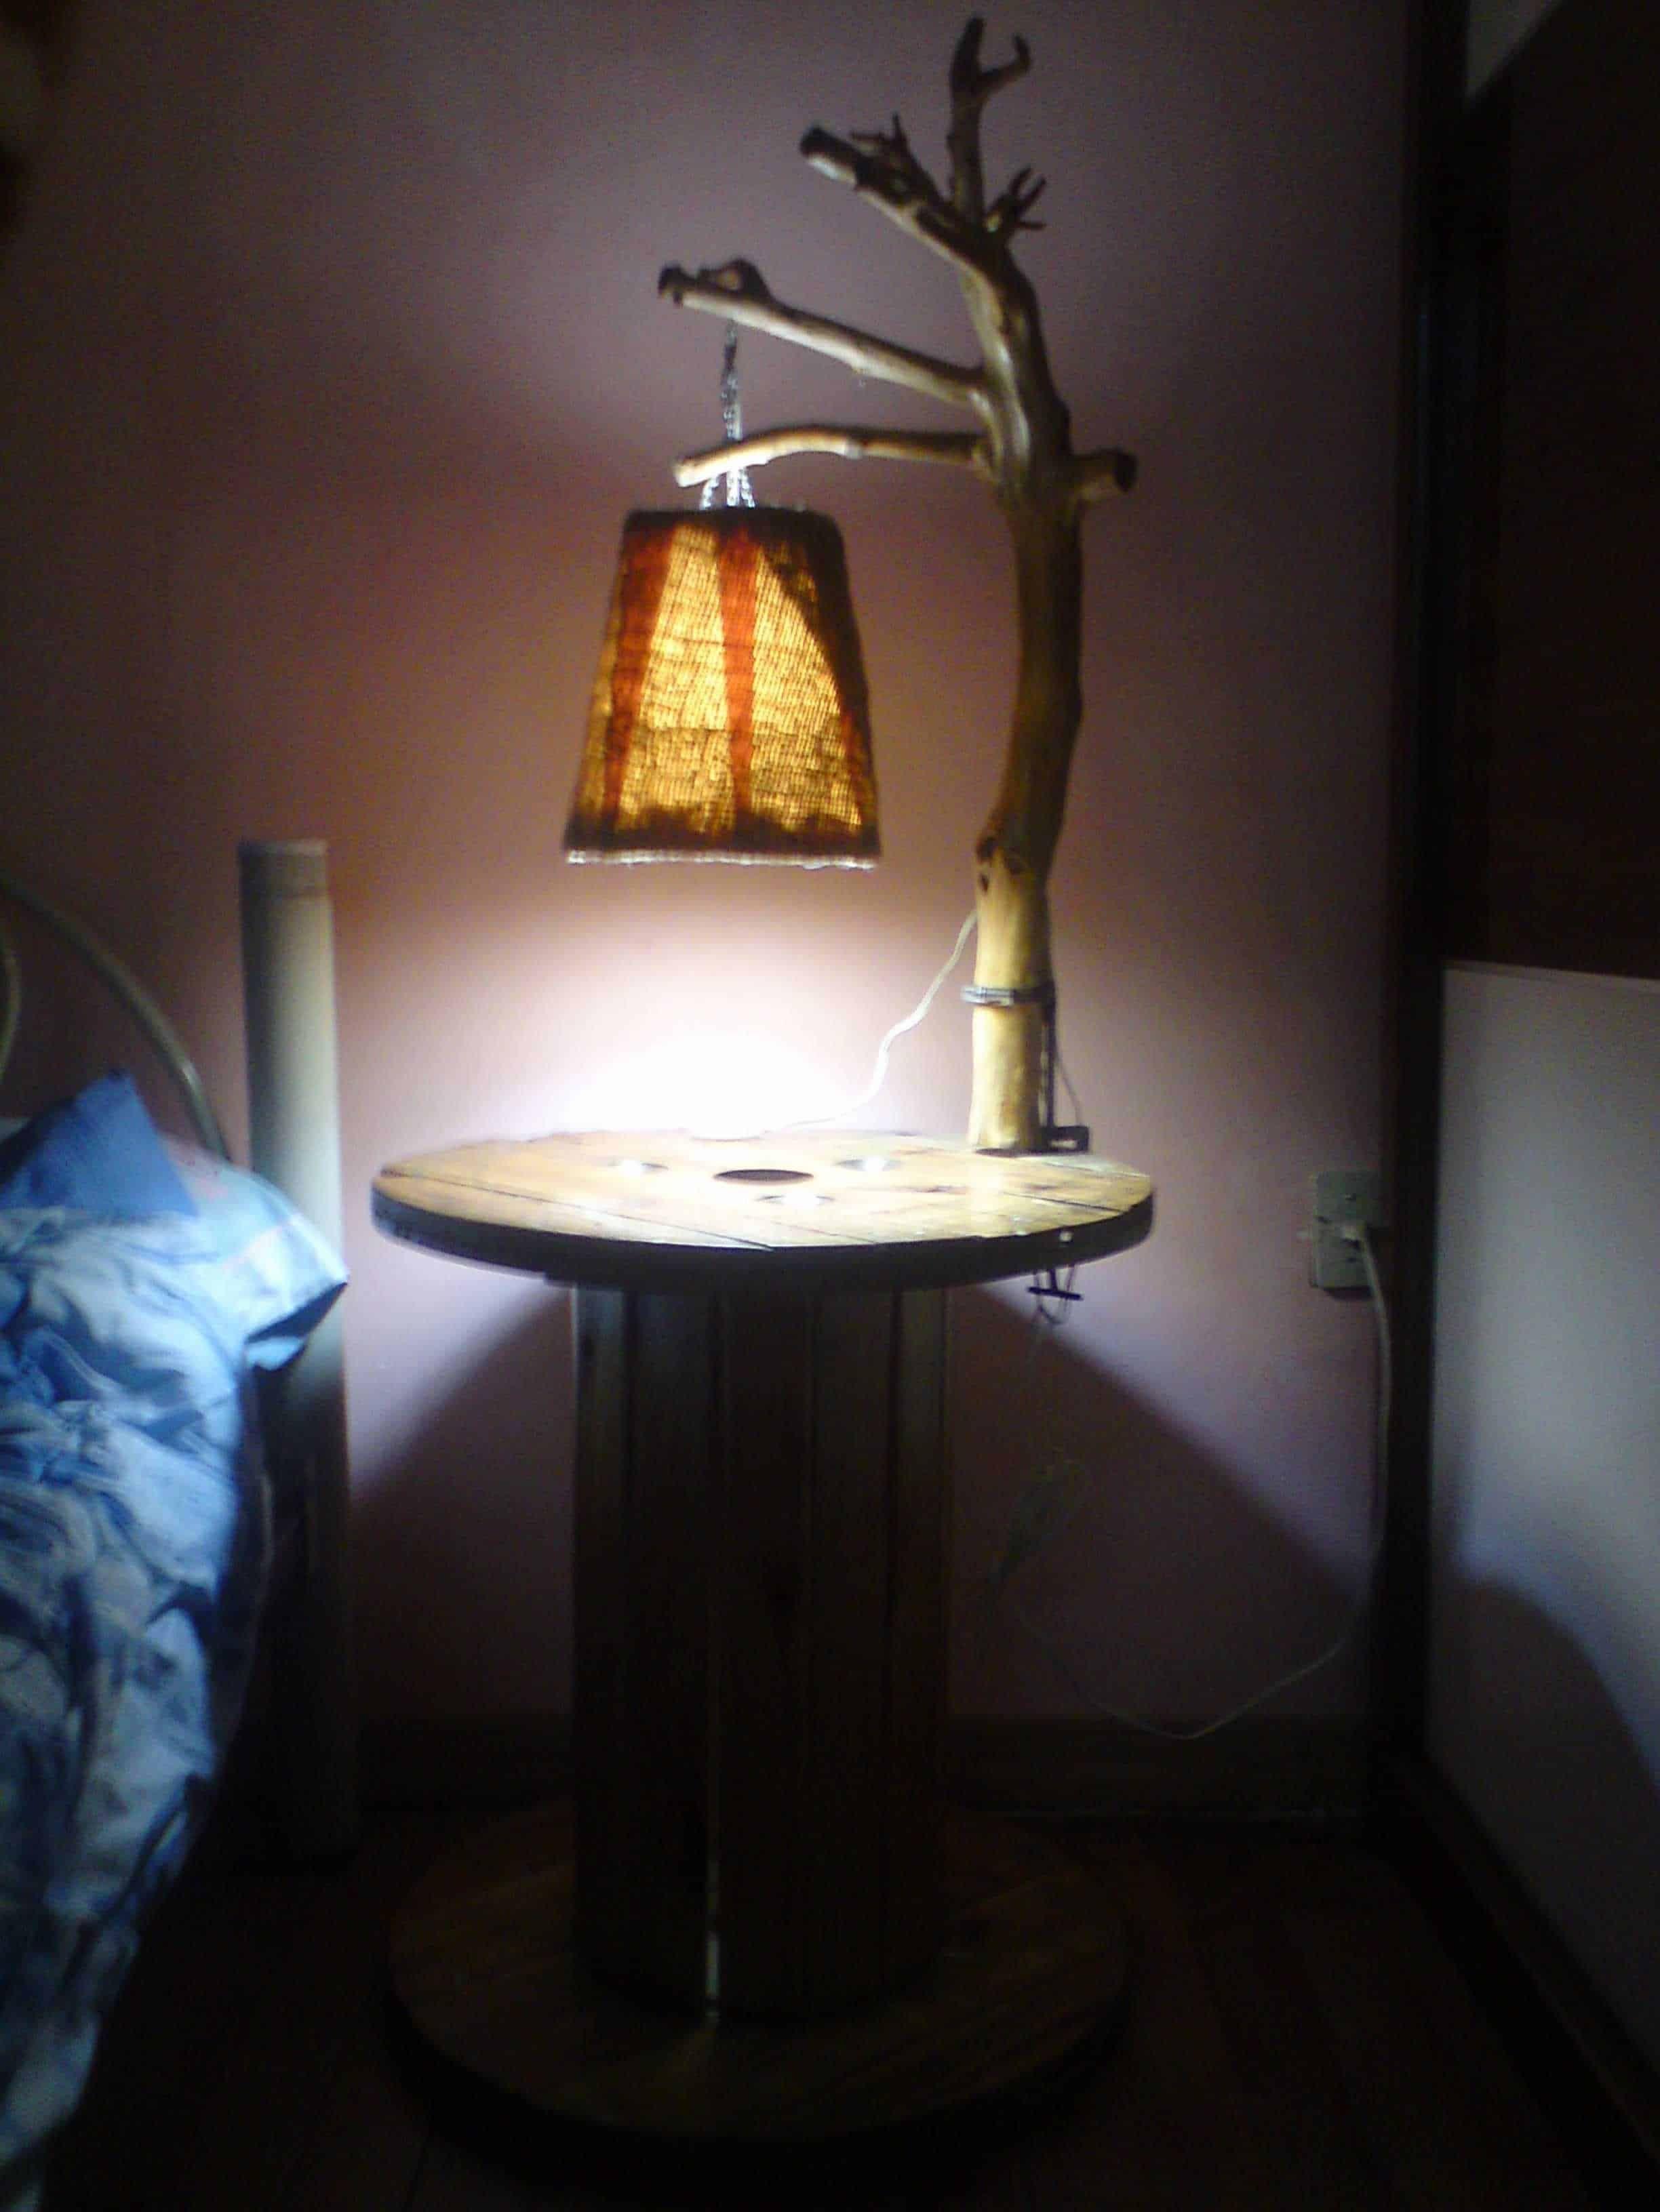 Lampara Y Mesa De Noche De Carrete Branch Lamp Reel Bedside Table 1001 Pallets Lamp Rustic Lamps Best Desk Lamp